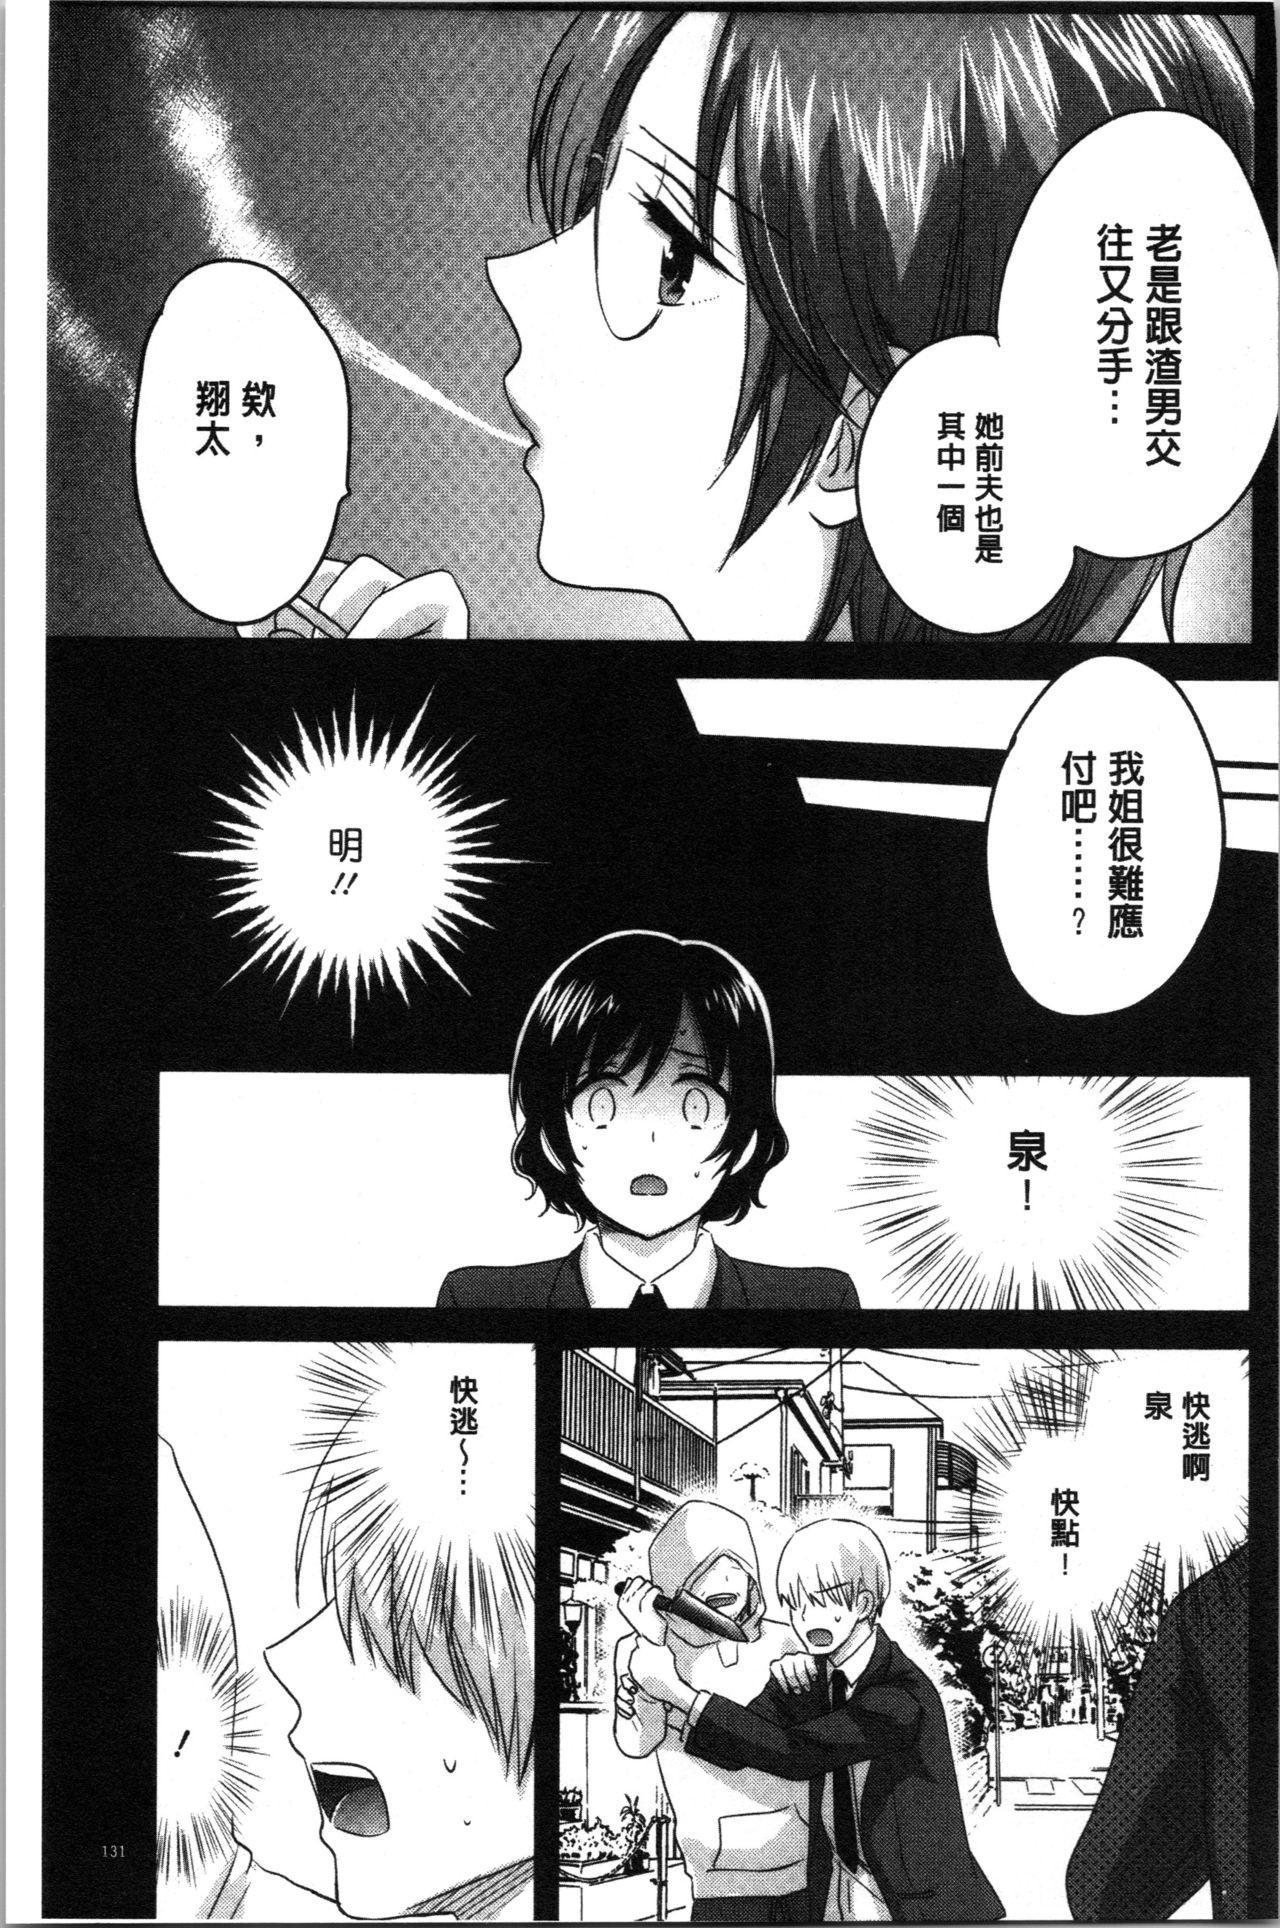 Ottori Midarana Mikami-san   嫻淑優雅又淫亂的三上小姐 132